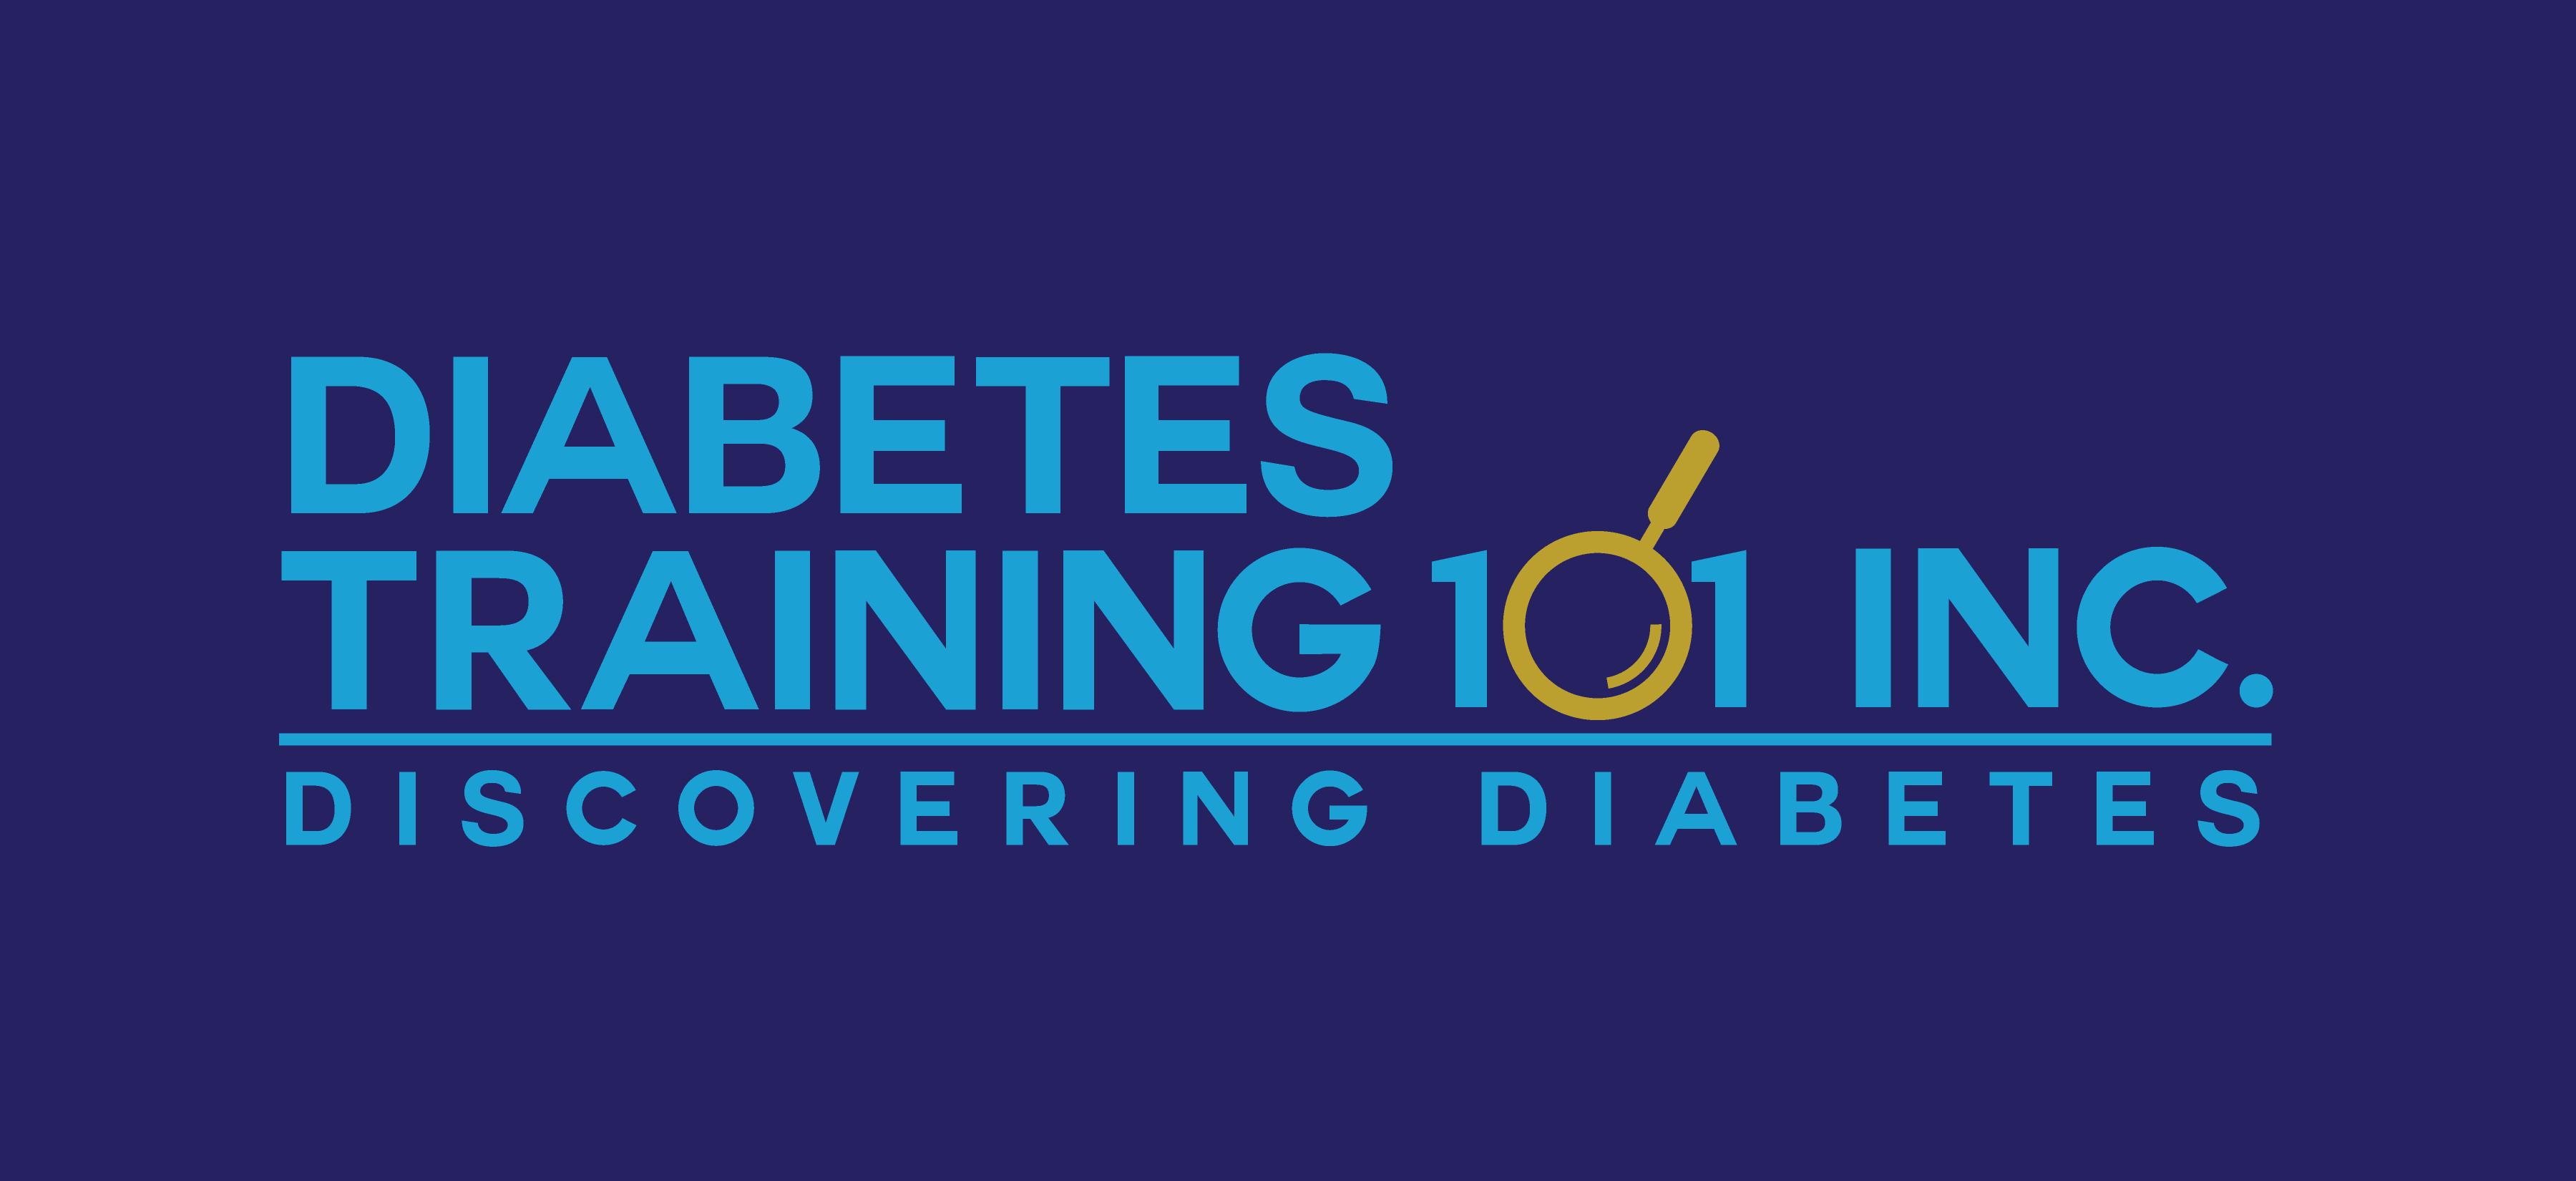 Diabetes Training 101 Inc.